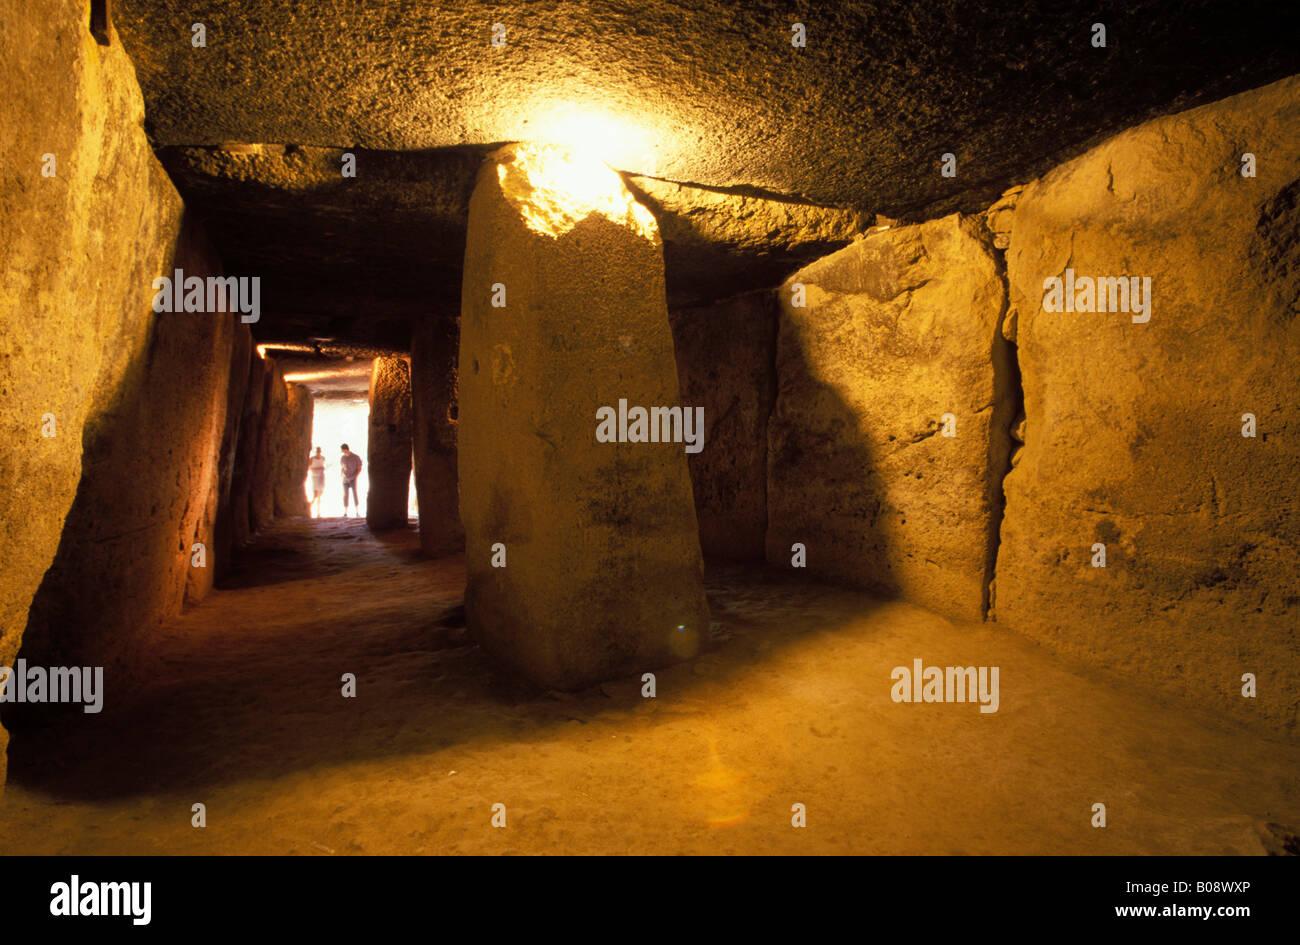 Dolmen de Menga, bronze-age burial chamber (dolmen), Antequera, Málaga Province, Andalusia, Spain - Stock Image